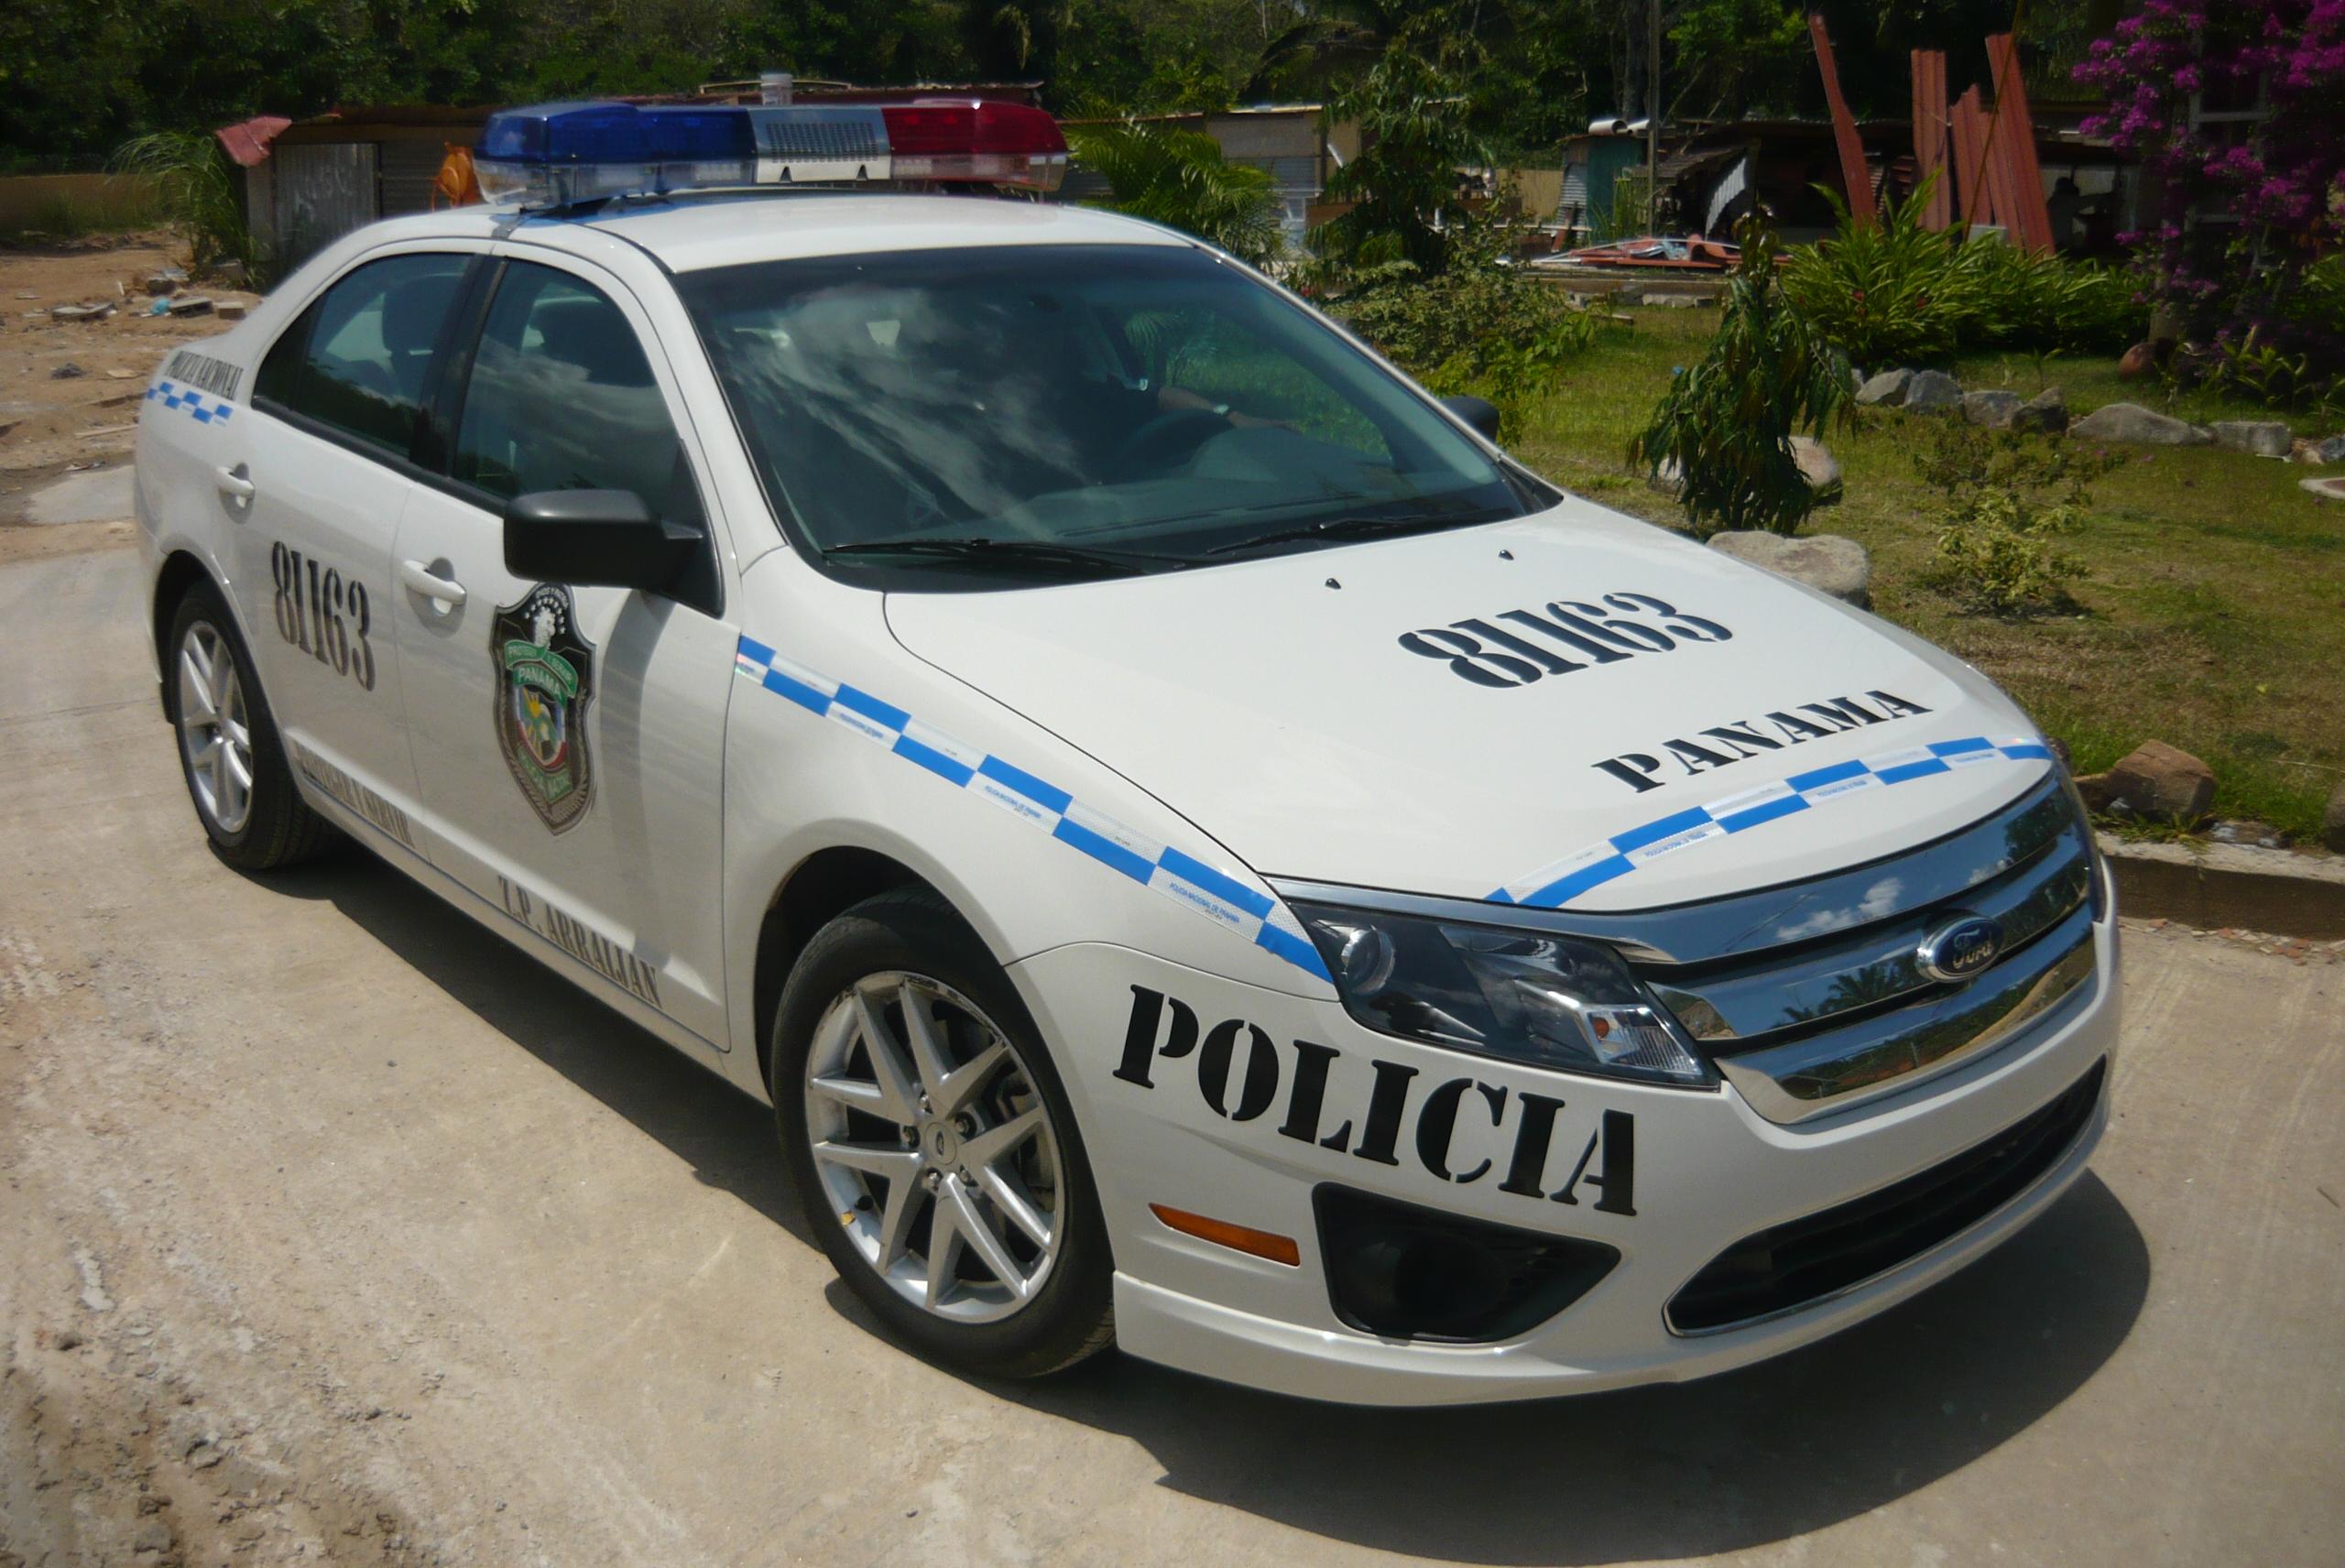 Policía Nacional garantizara seguridad en Alanje durante Semana Santa